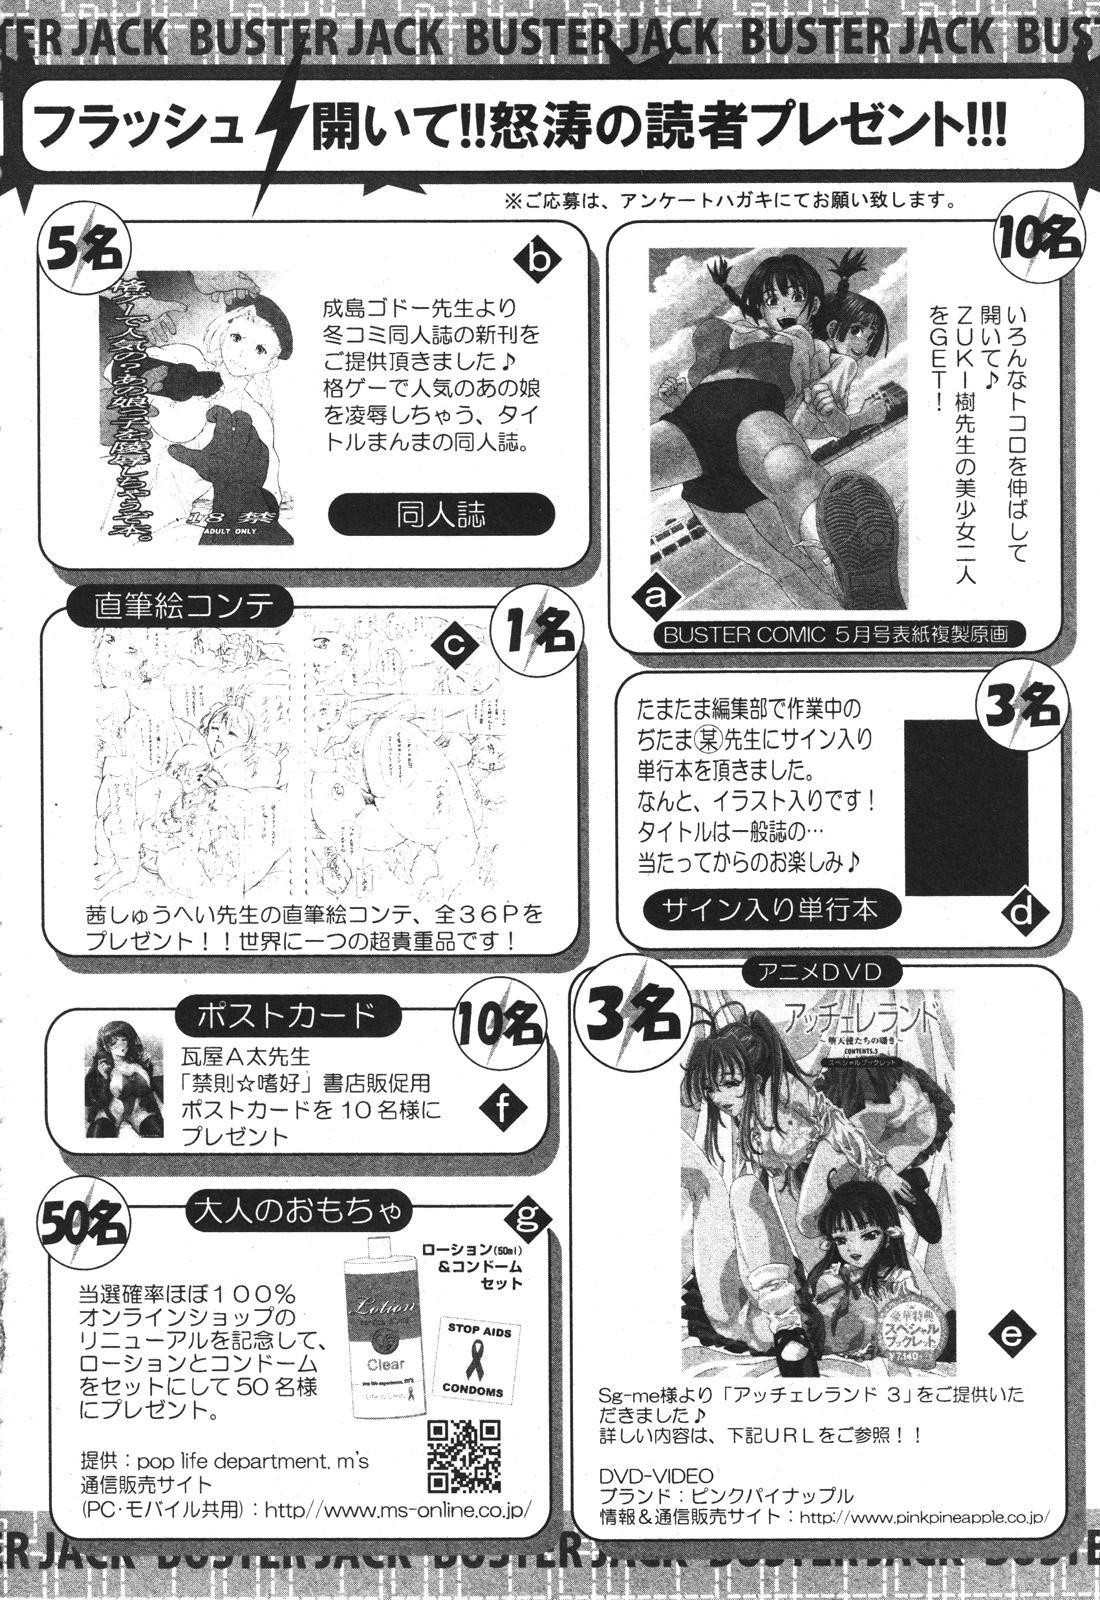 BUSTER COMIC 2010-05 Vol.07 484